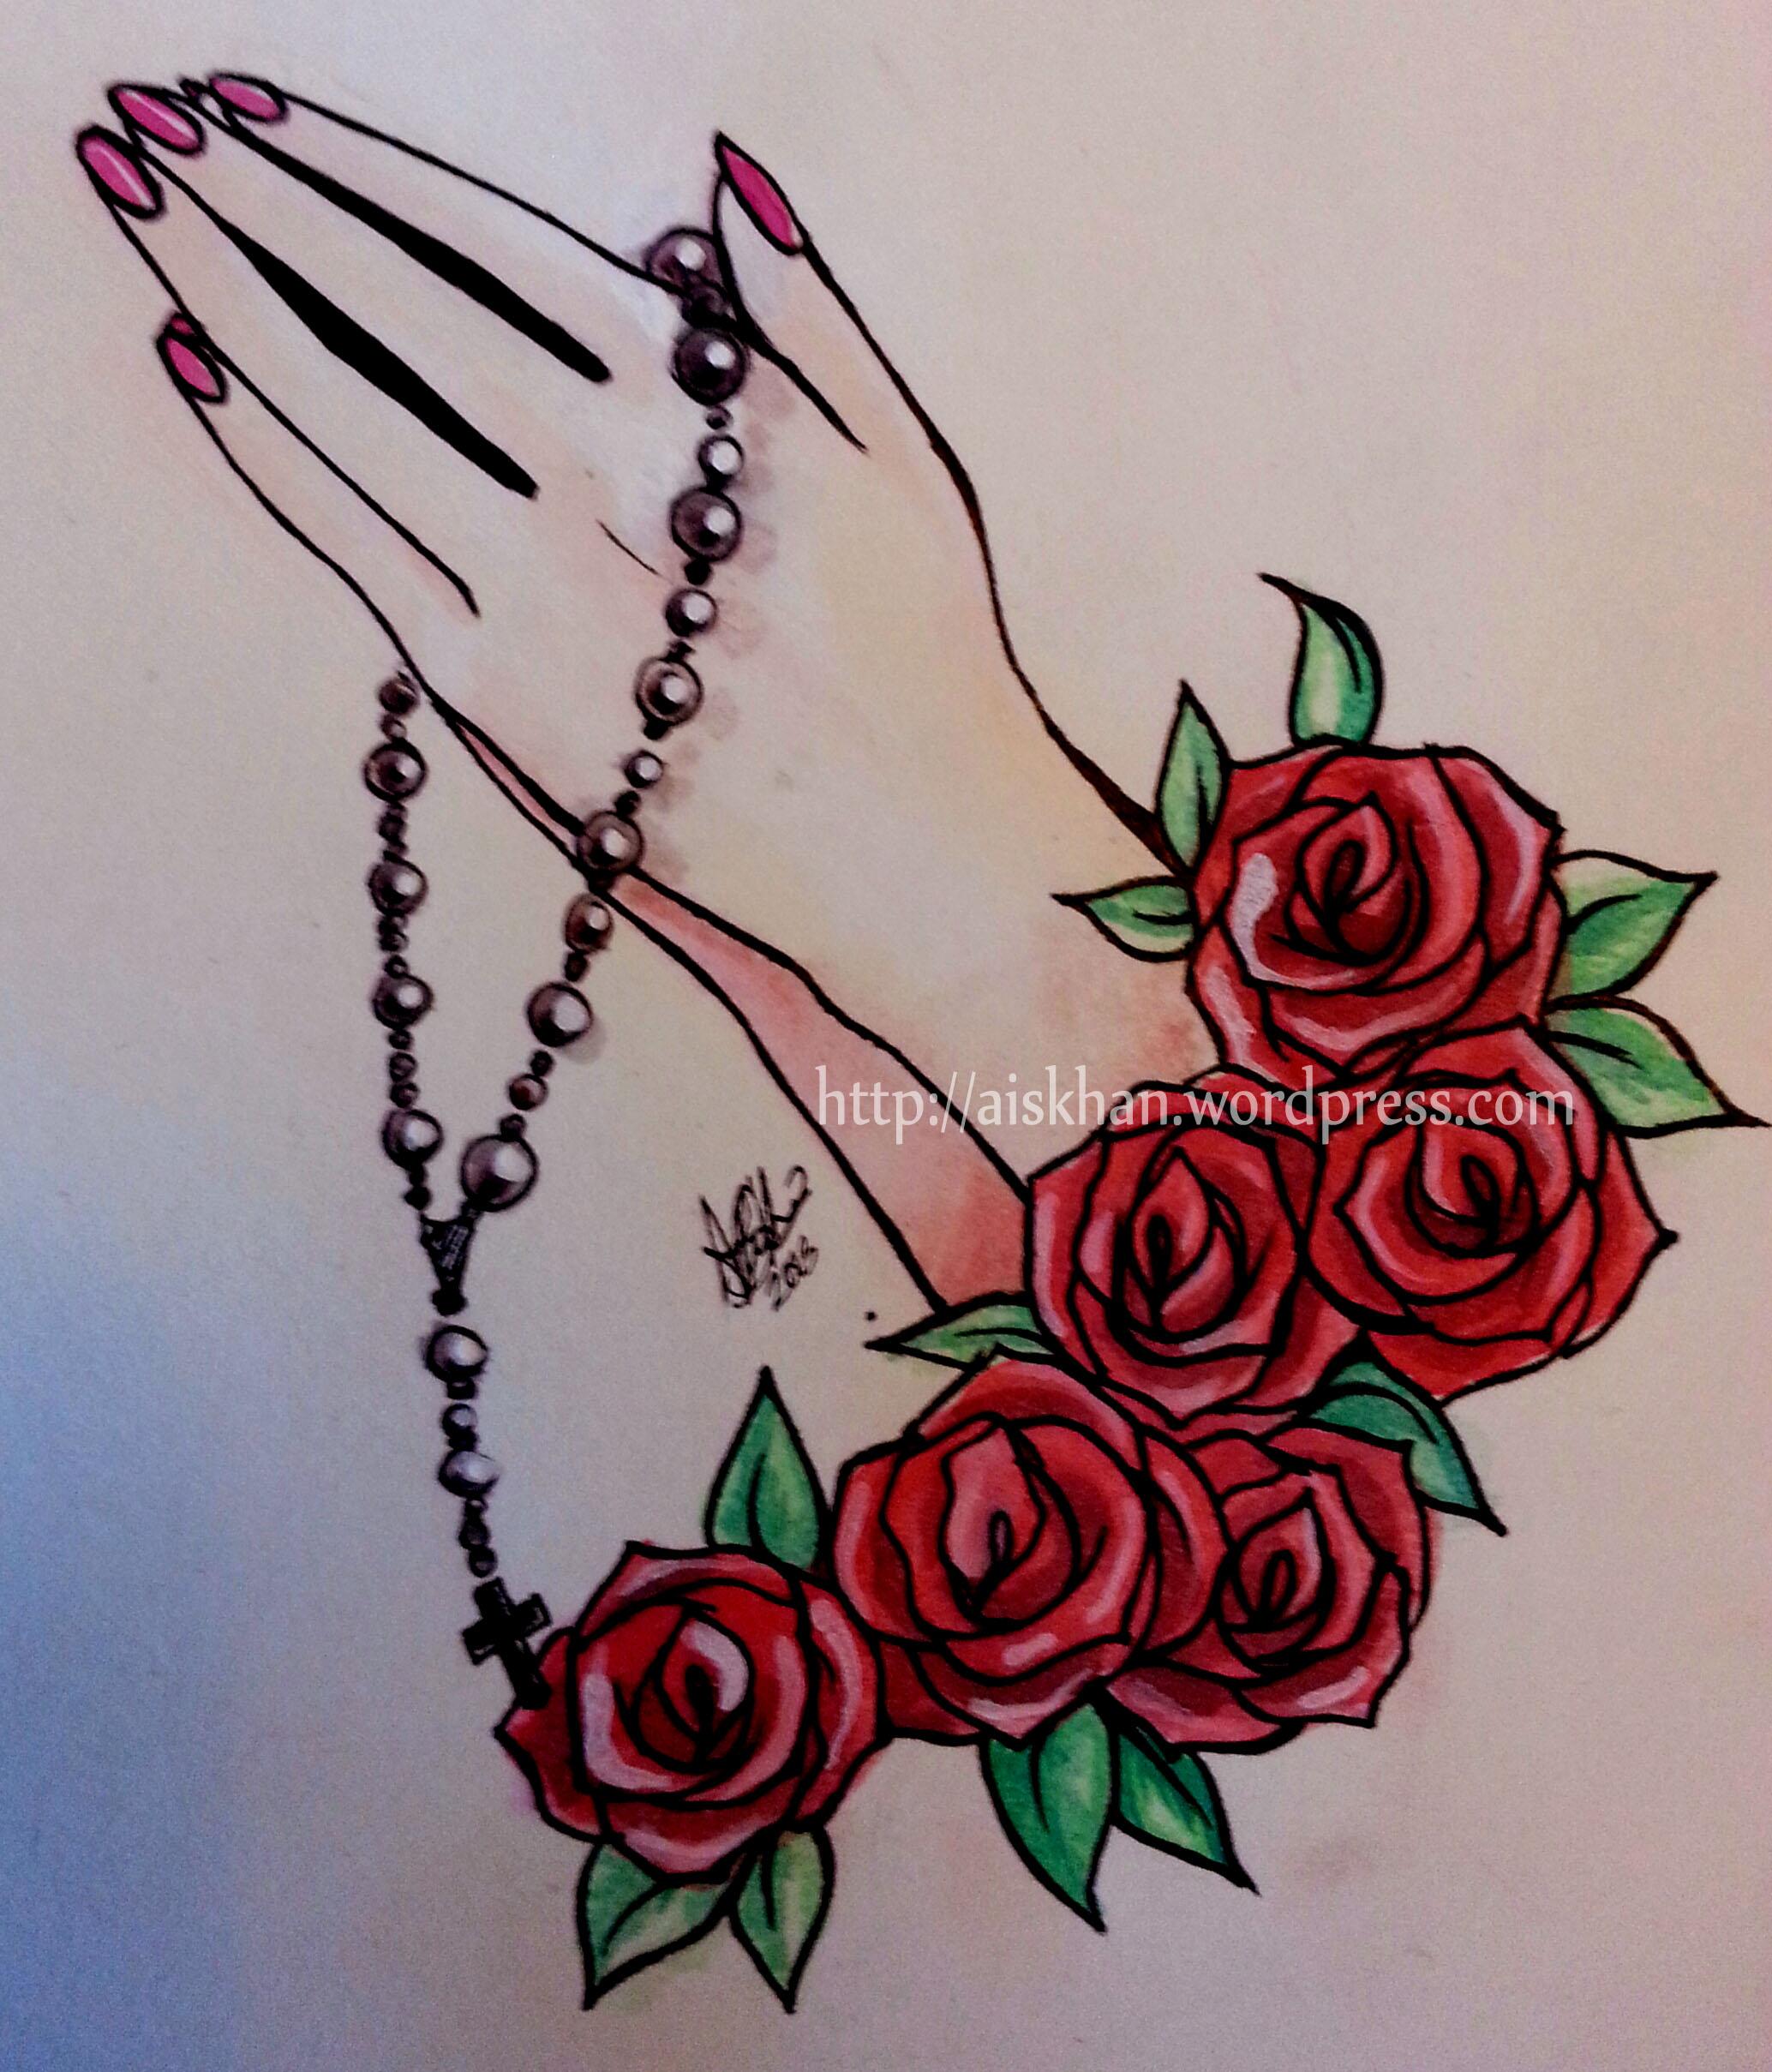 2068x2418 Praying Hands Tattoo Design Ayesha Khan